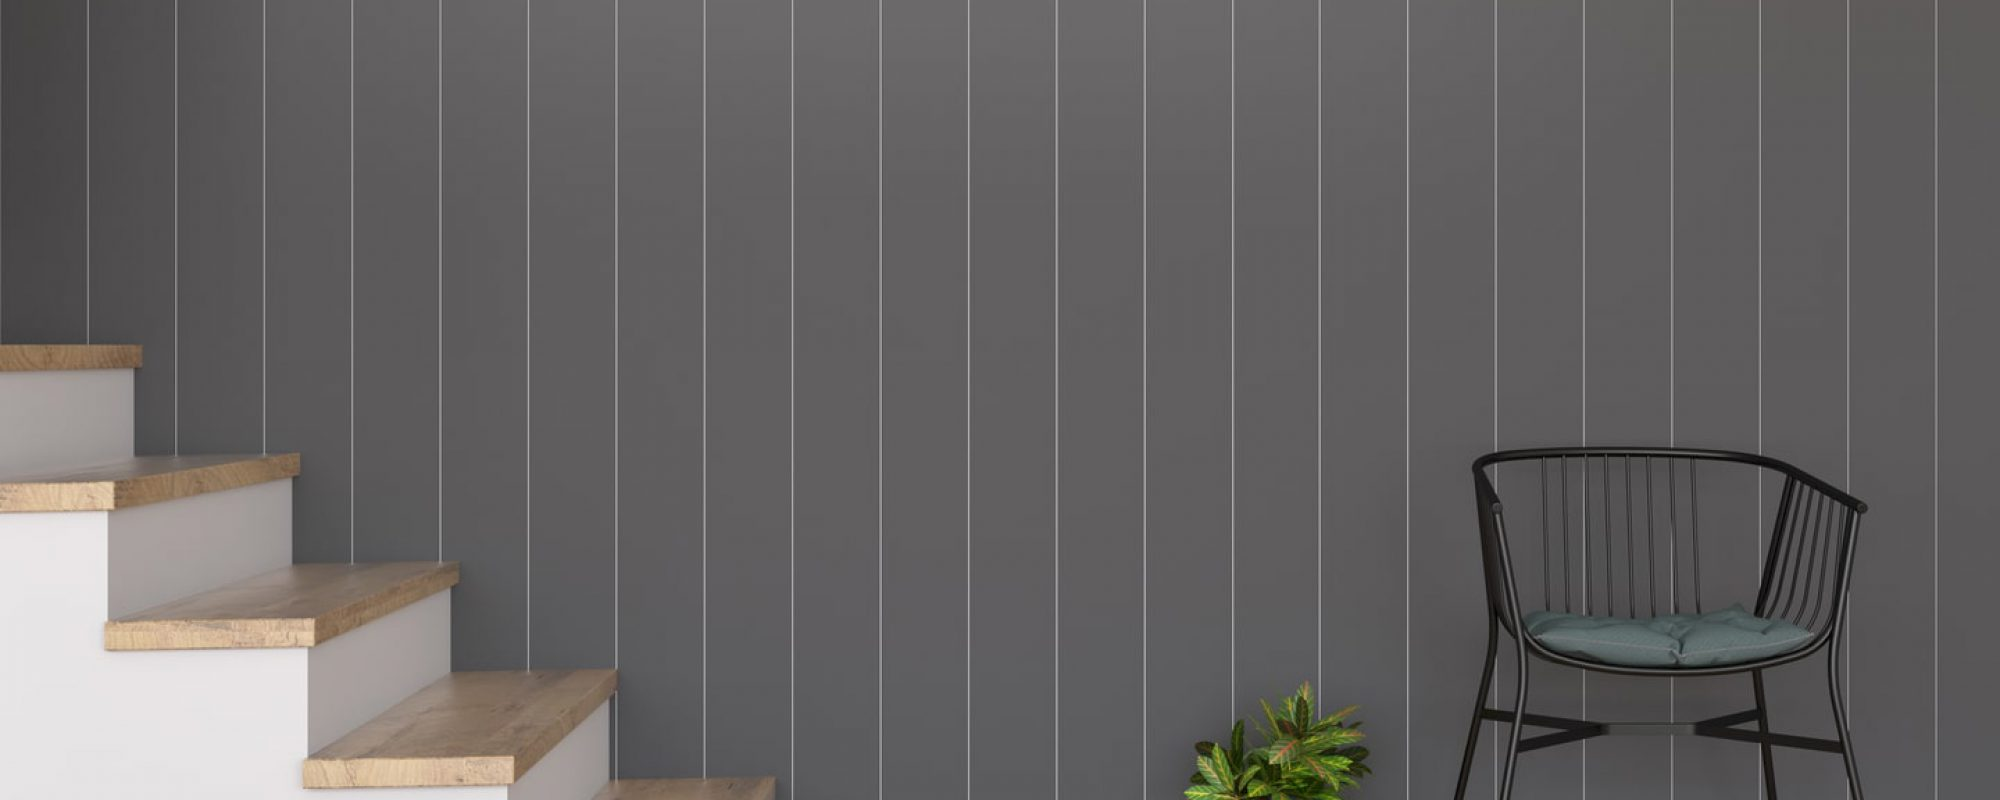 modern-style-interior-design-3d-rendering-8G3N9EA-min